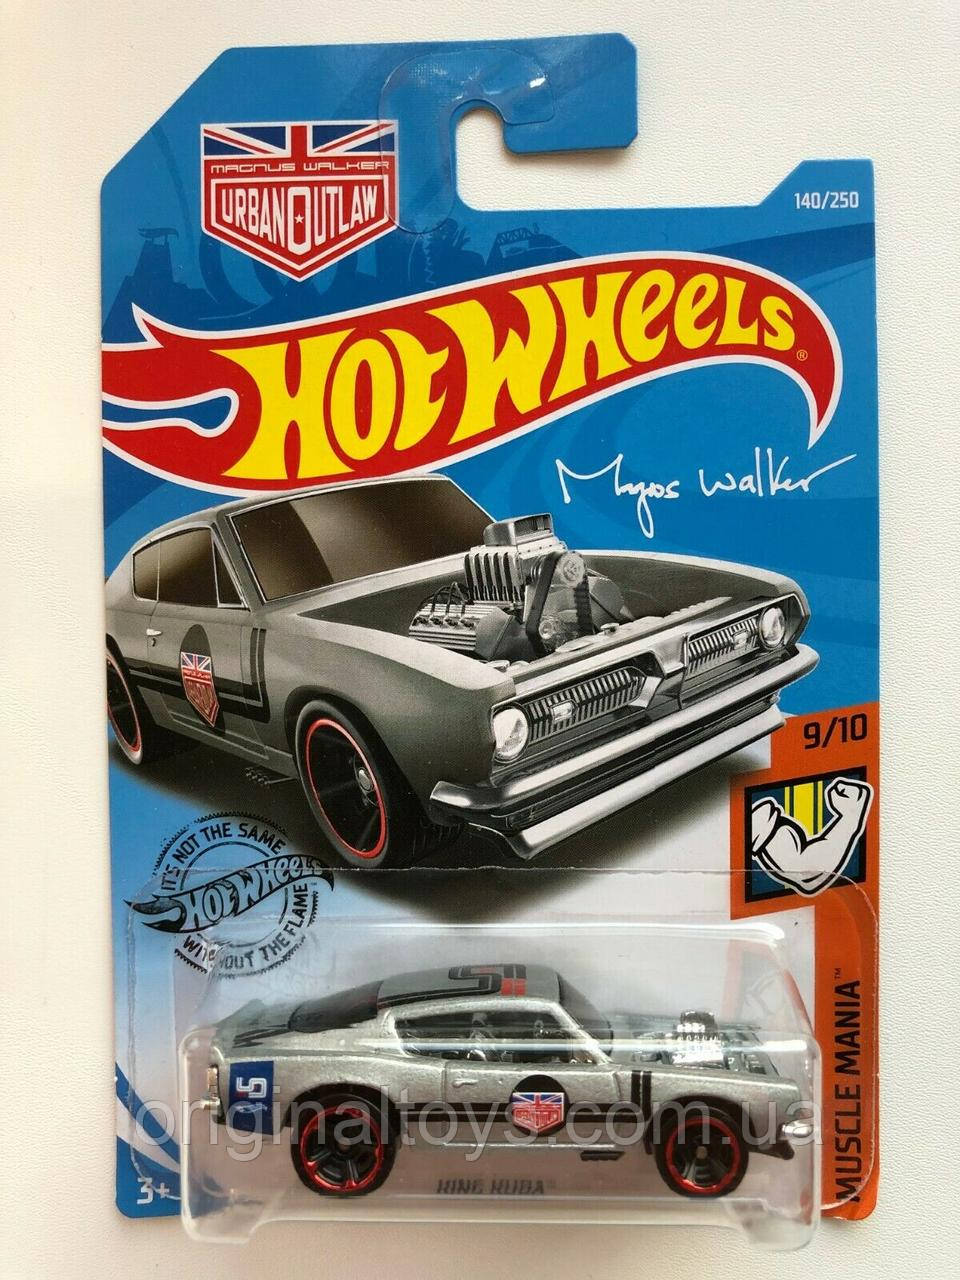 Базовая машинка Hot Wheels King Kuda